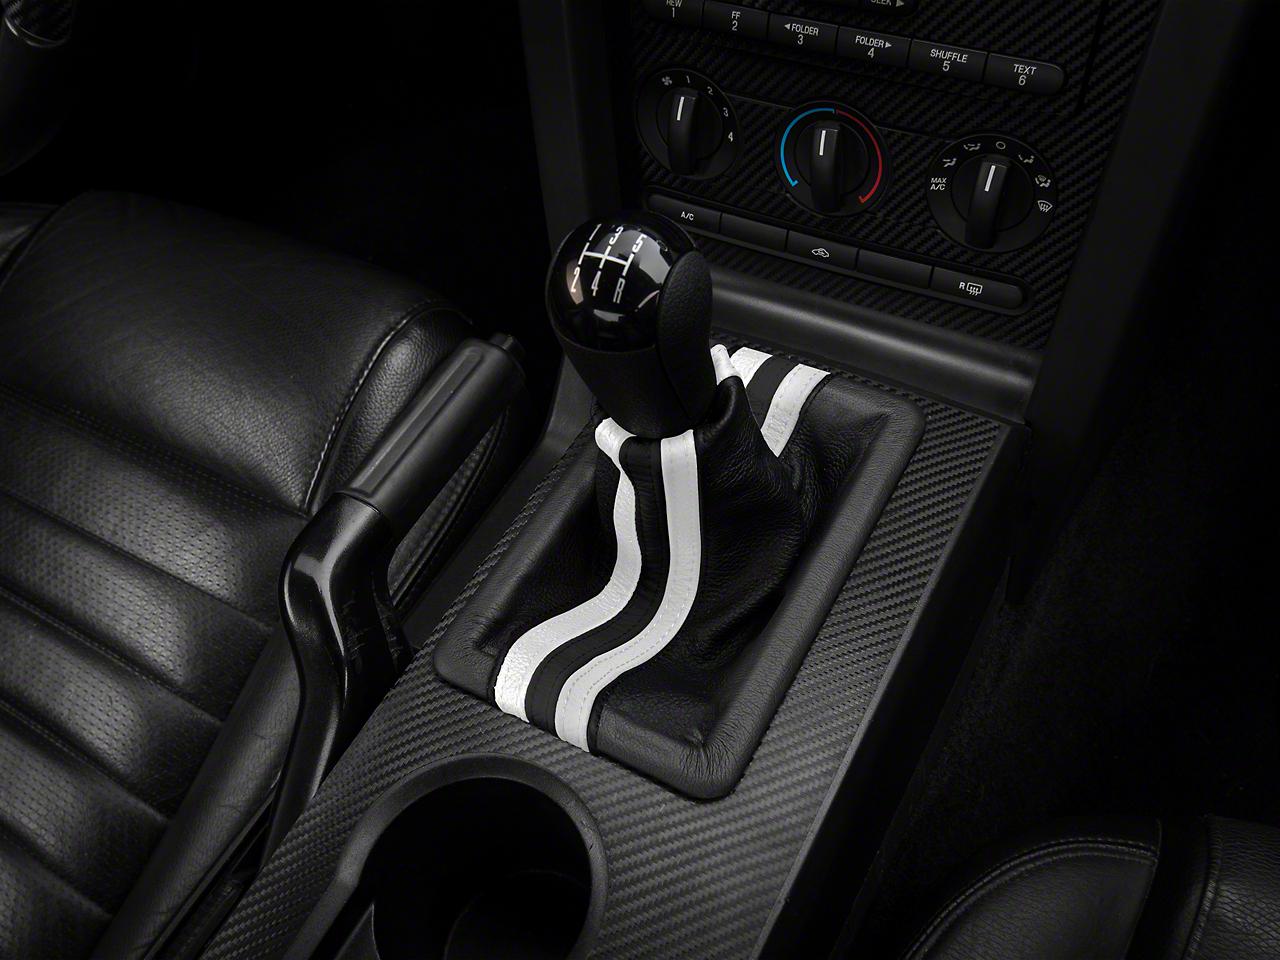 Premium Black Leather Shift Boot - Dual White Stripe (05-09 GT, V6)